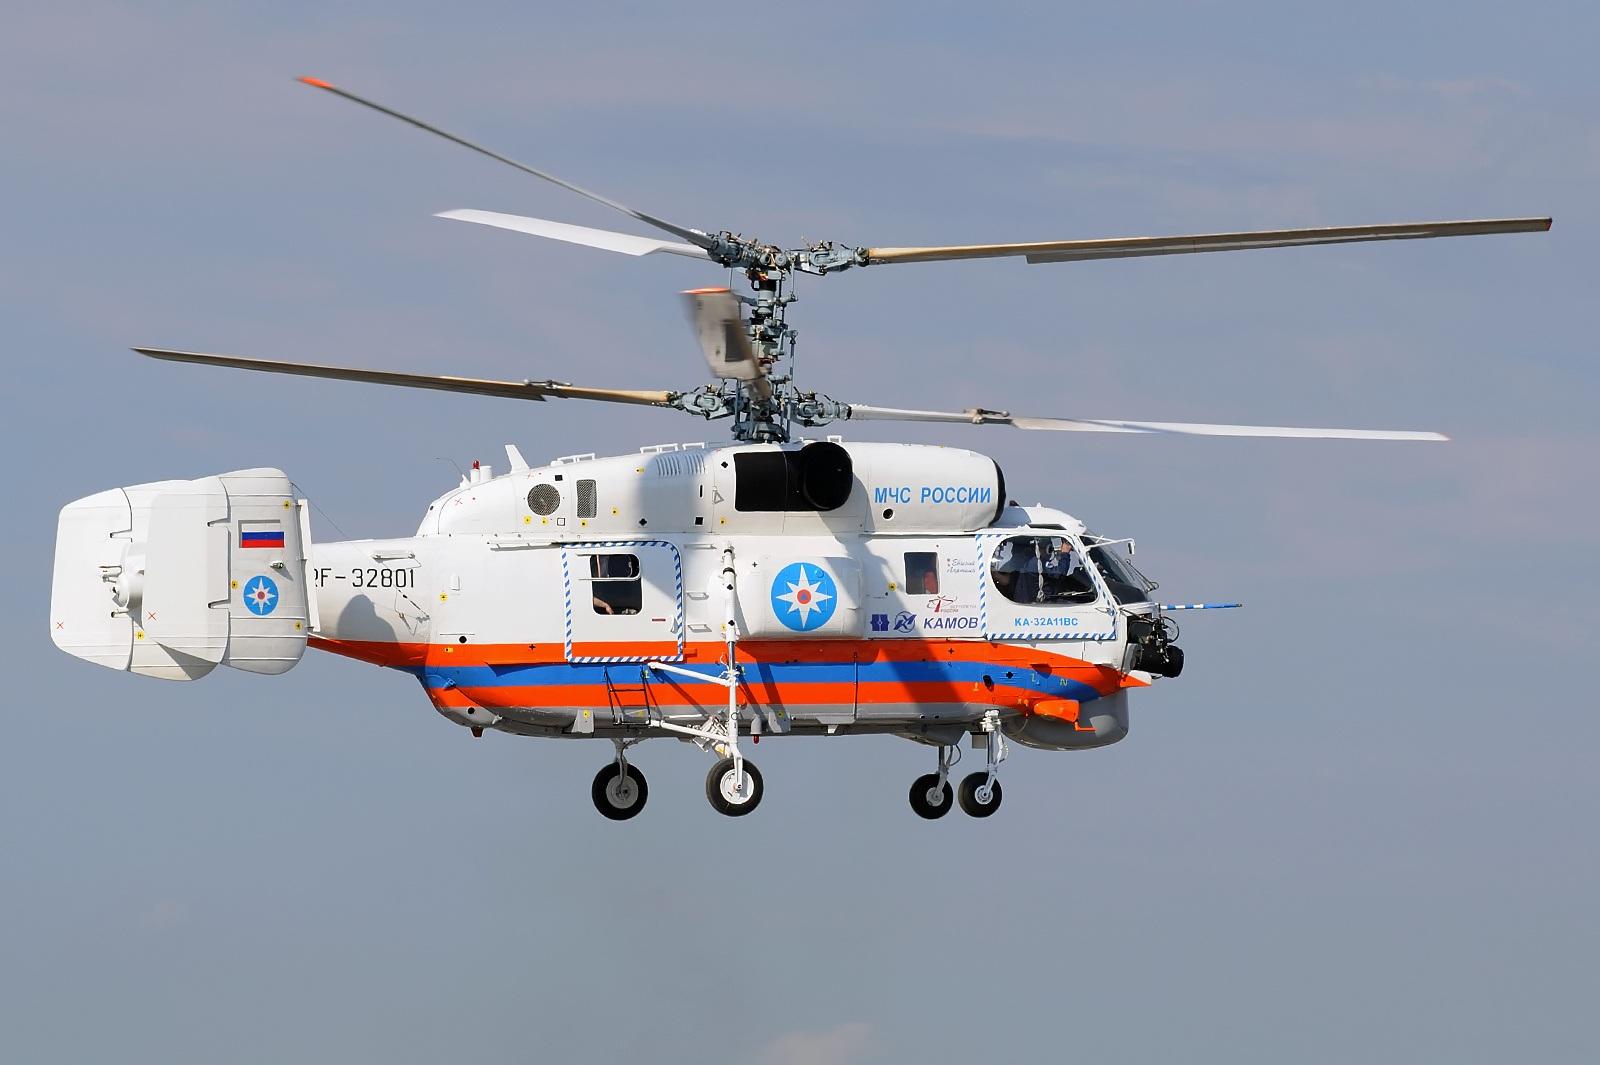 روسيا تعلن اكتمال تسليم تركيا 3 مروحيات نوع Ka-32A11BC Mchs_rossii_kamov_ka-32a11bc